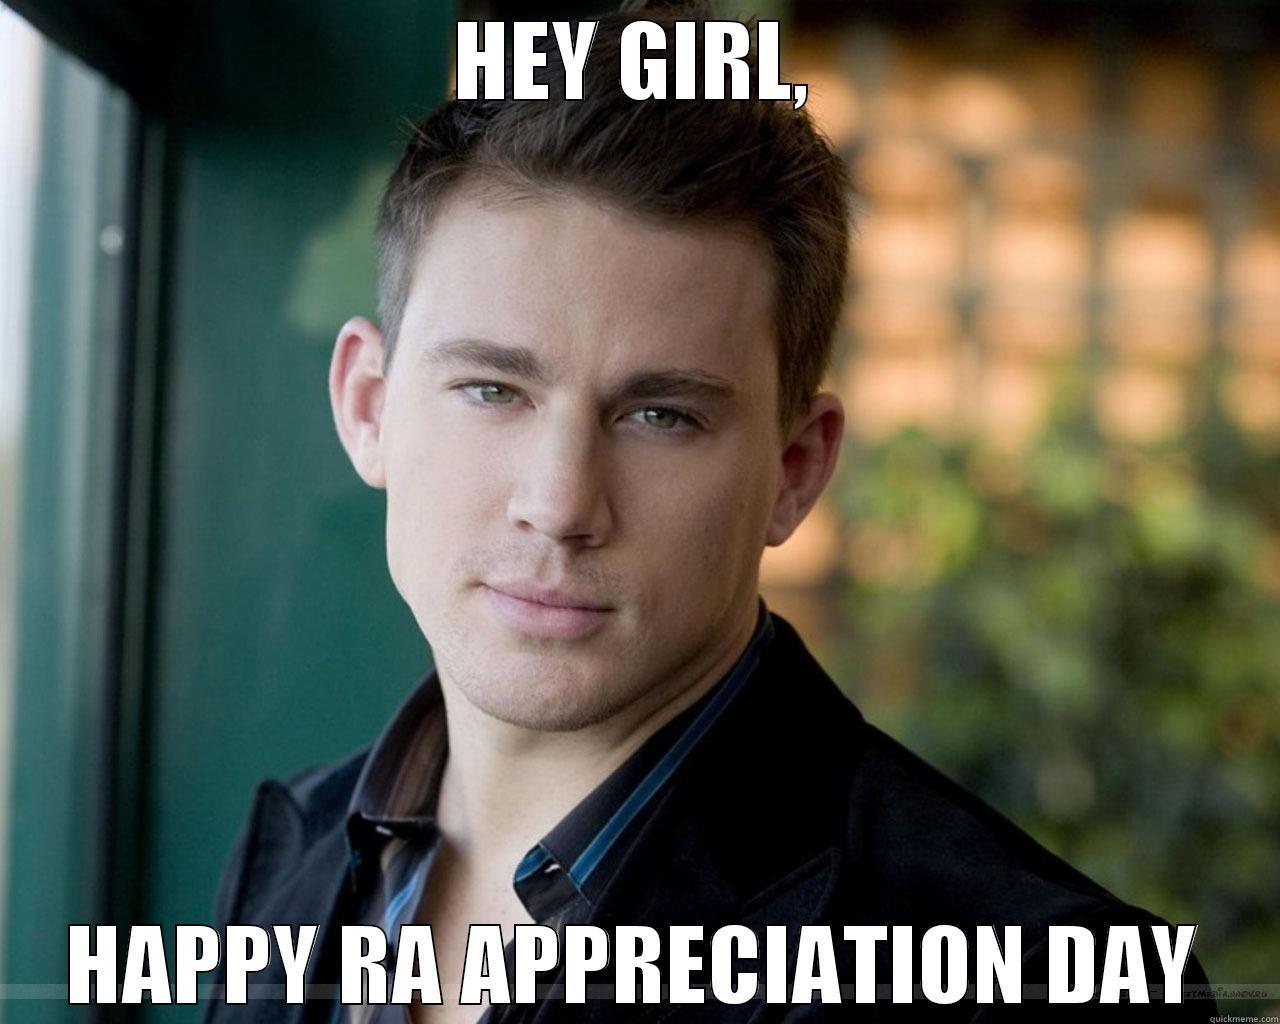 Happy RA Appreciation day! - HEY GIRL, HAPPY RA APPRECIATION DAY Misc